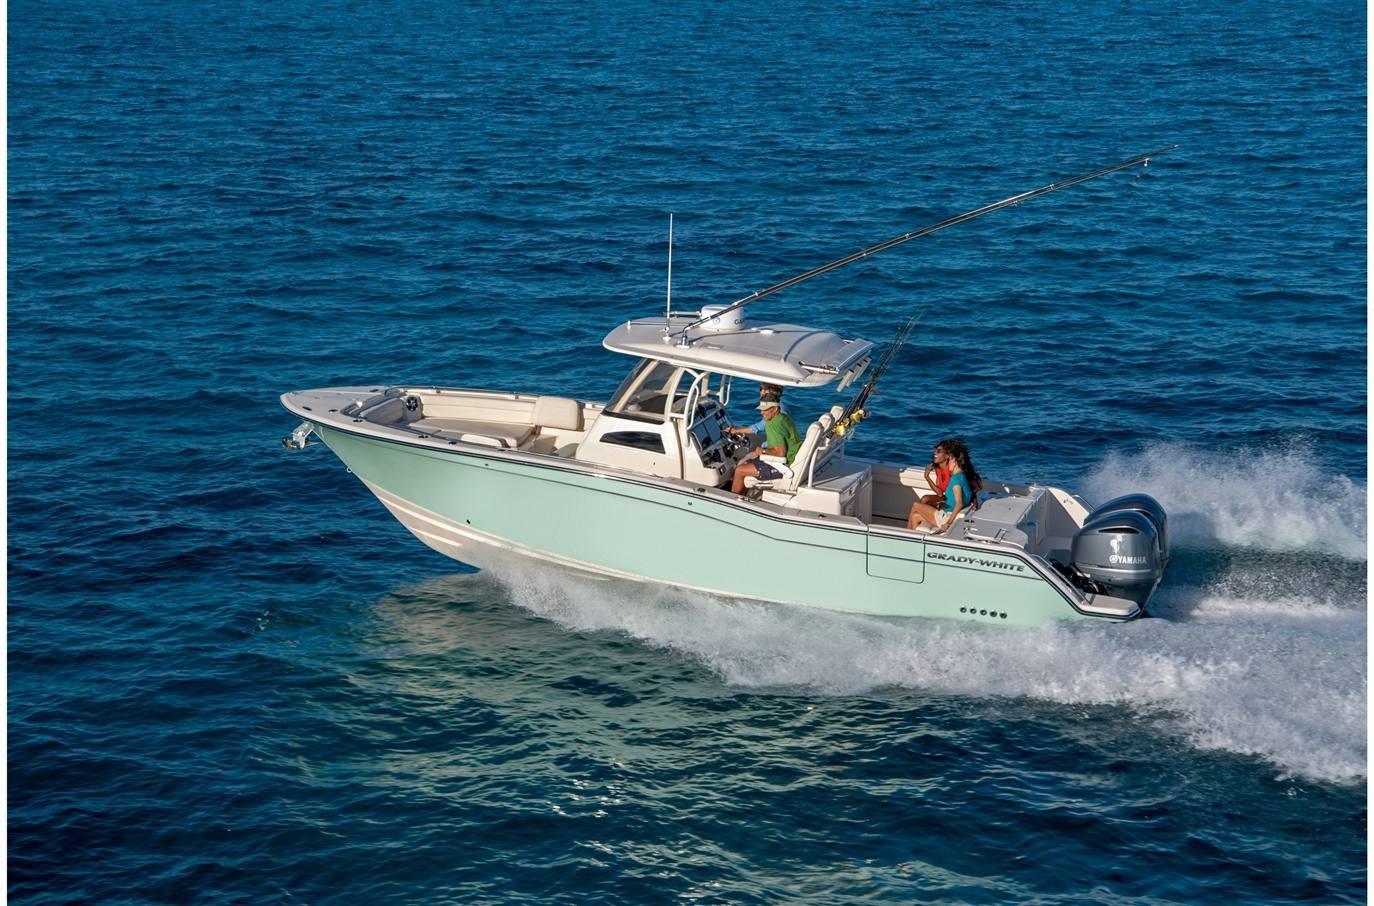 2019 Grady-White Canyon 326 for sale in Newport Beach, CA  Schock